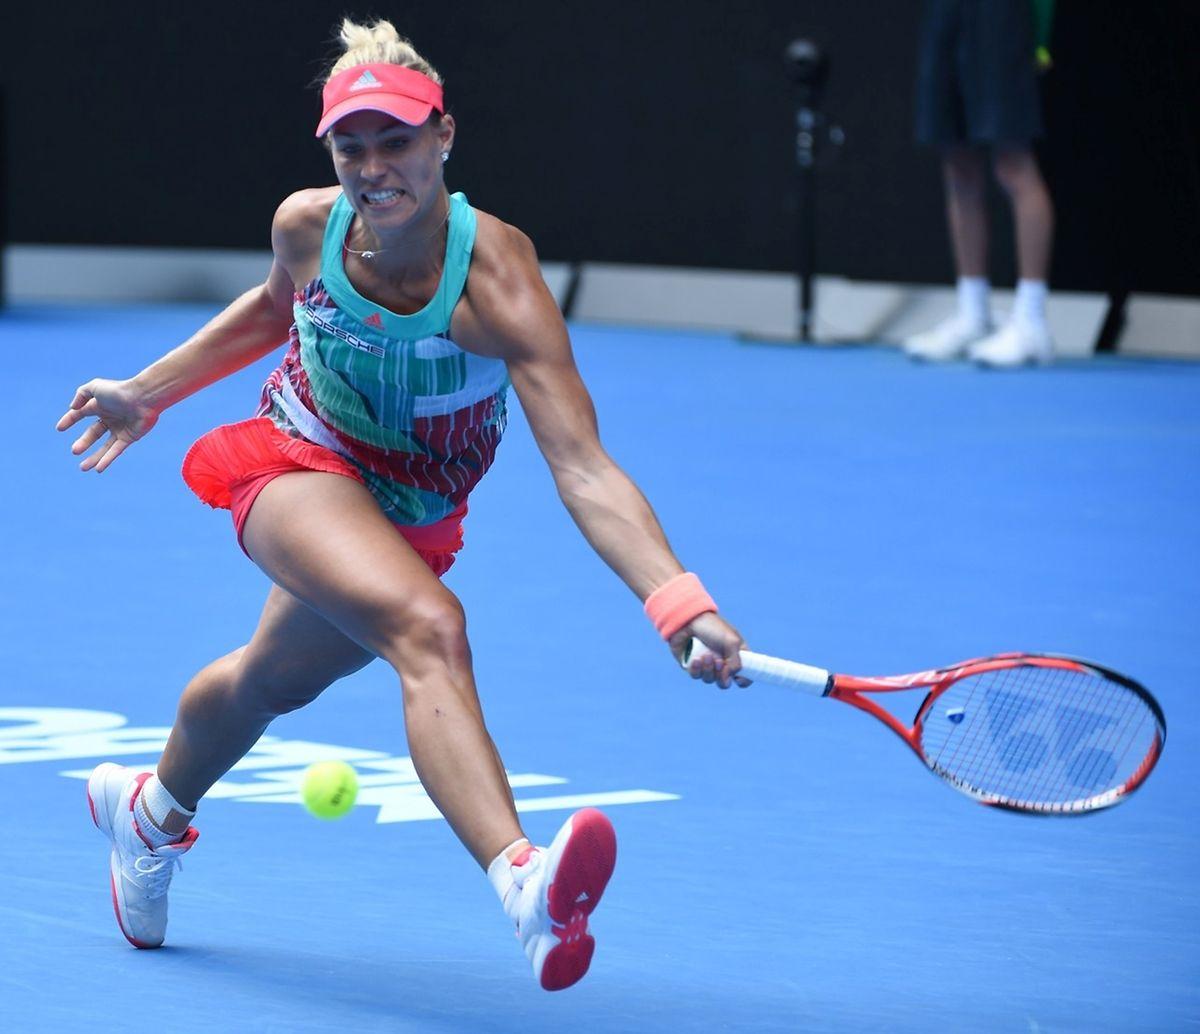 La gauchère Allemande Angelique Kerber disputera sa première finale en Grand Chelem, samedi face à Serena Williams